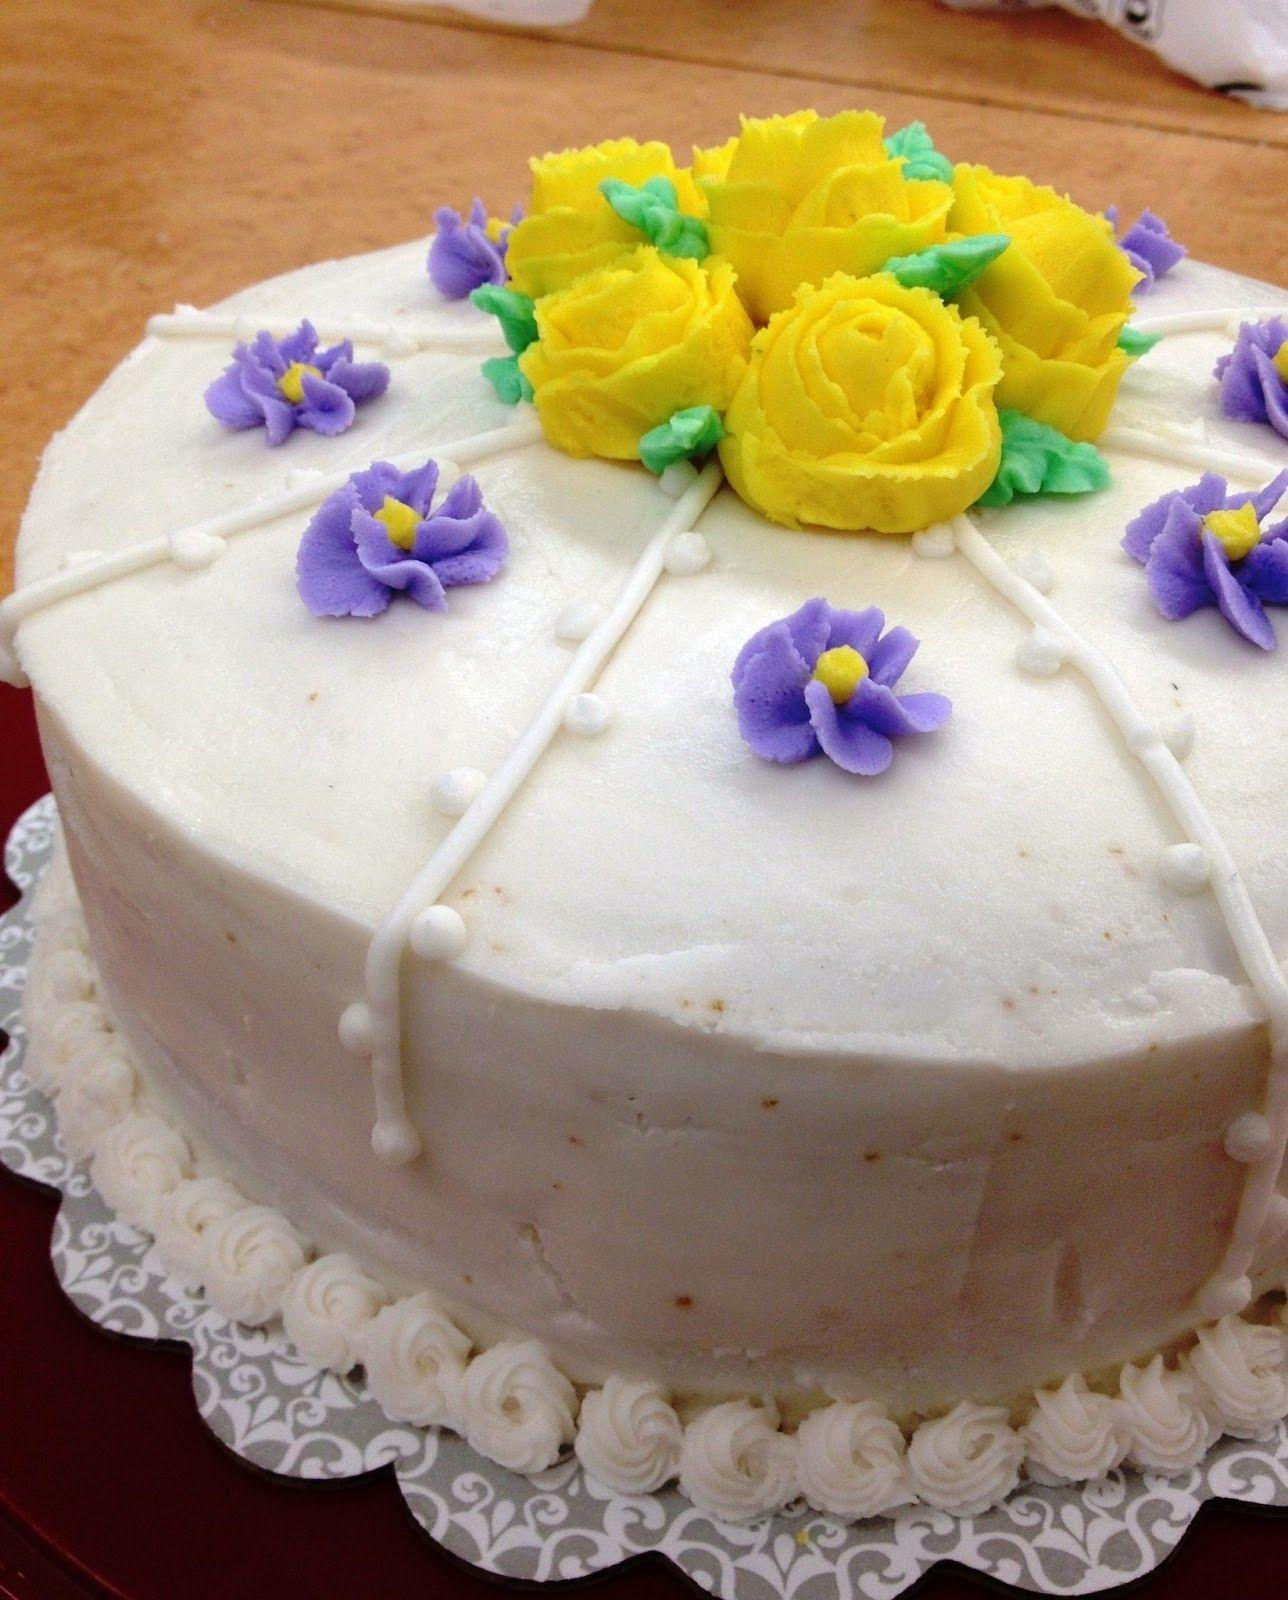 Michaels Cake Decorating Class Sign Up Amazing Wilton Cake Decorating  Wilton's Cake Decorating  Course 1 Week Decorating Inspiration